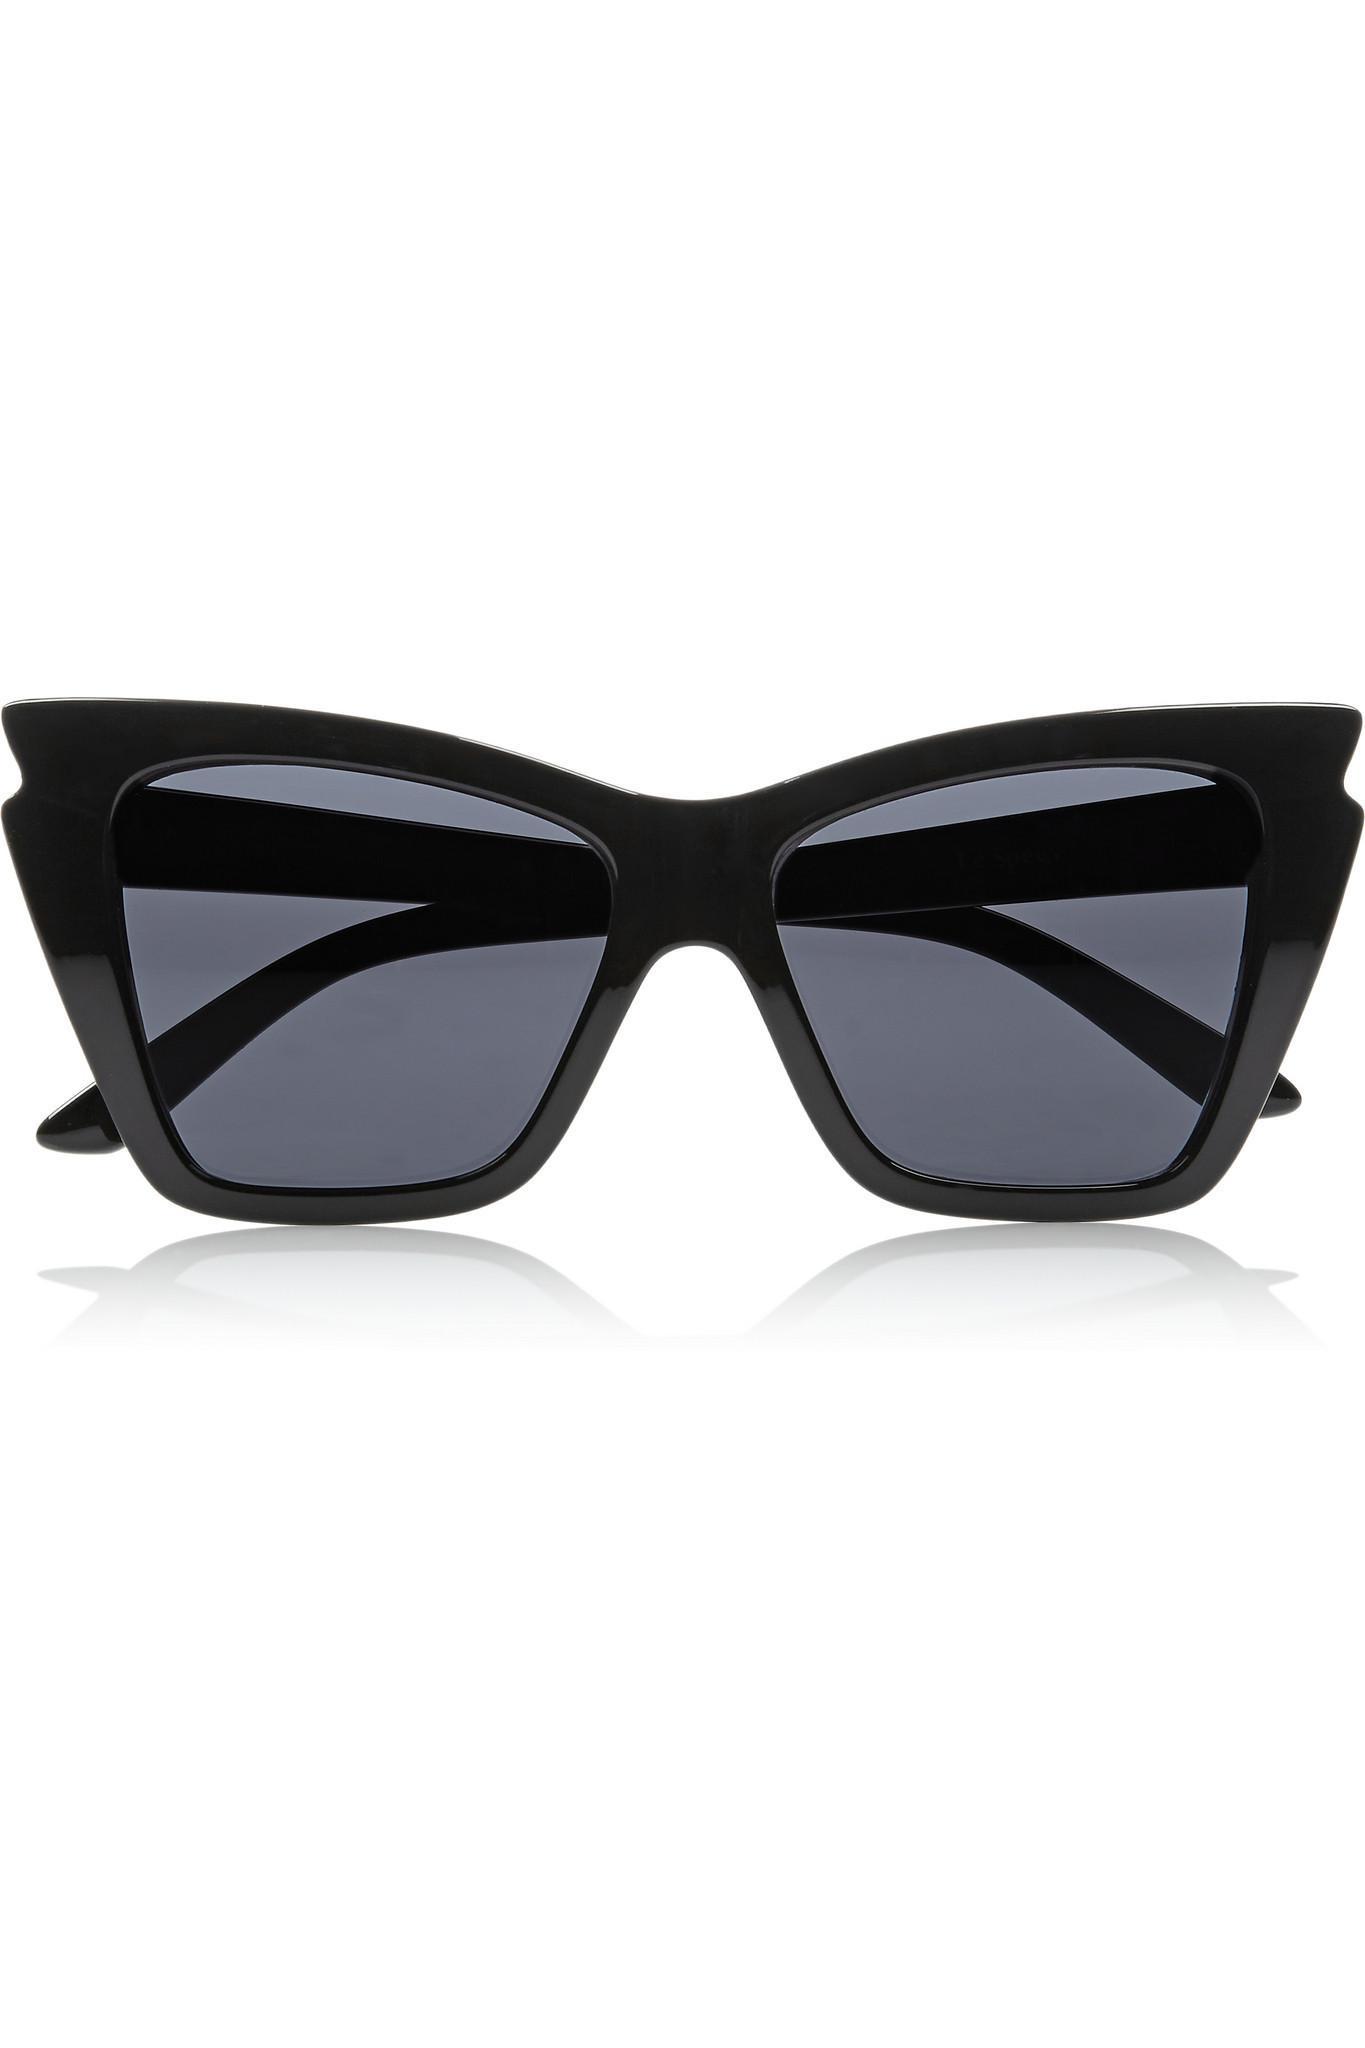 2bb4465cfa Lyst - Le Specs Rapture Cat-eye Acetate Sunglasses in Black - Save 8%